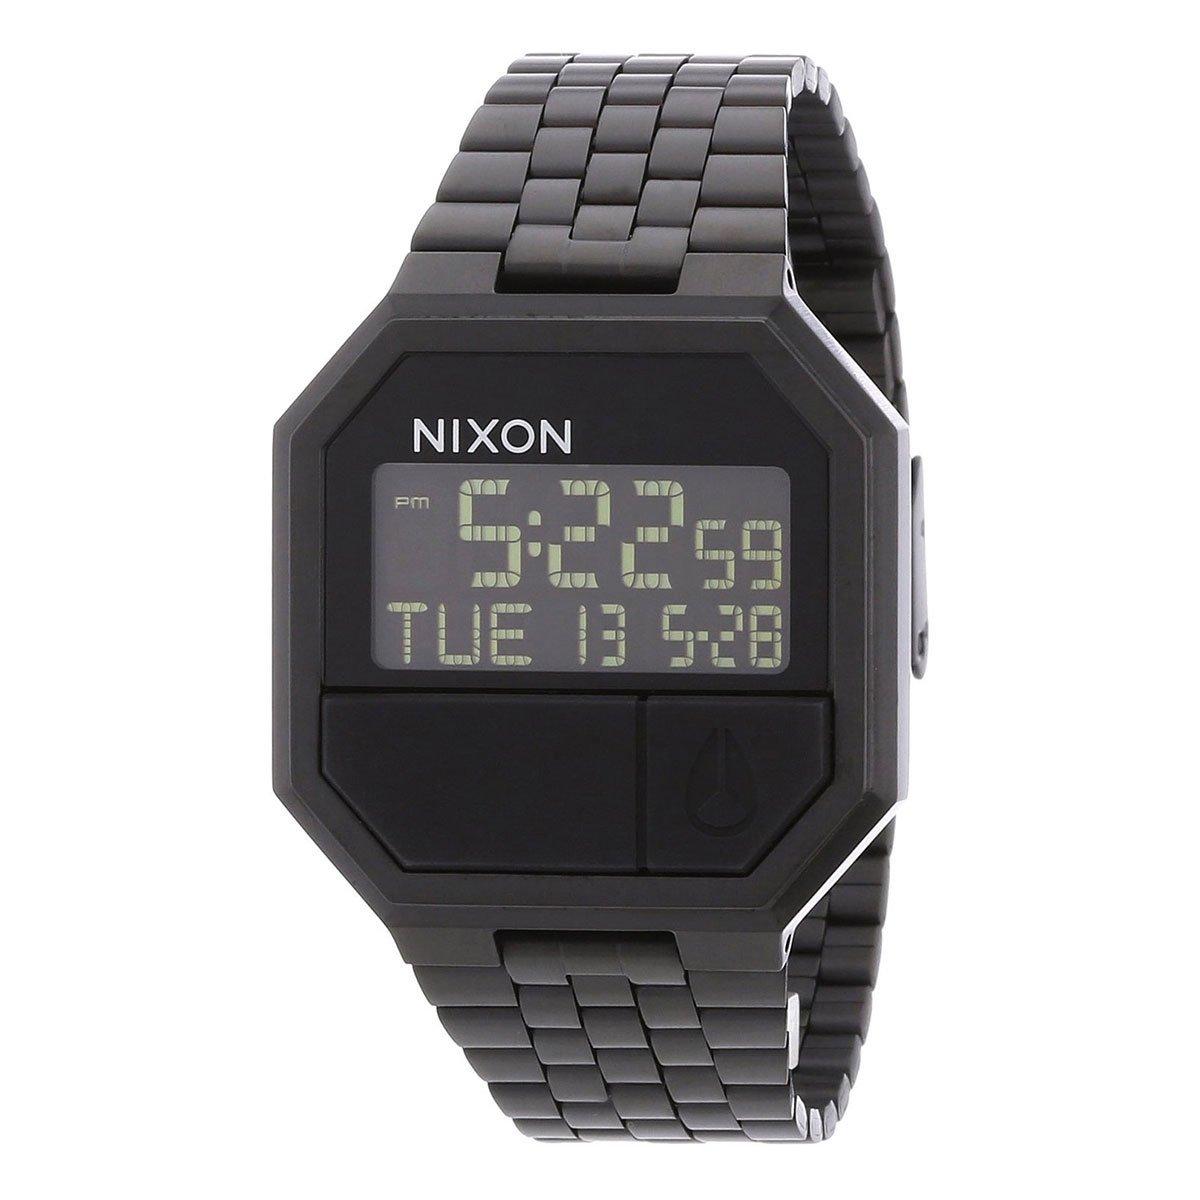 Nixon Re-Run A158. 100m Water Resistant Men's Digital All Black Watch (38.5mm Digital Watch Face. 13-18mm Stainless Steel Band)